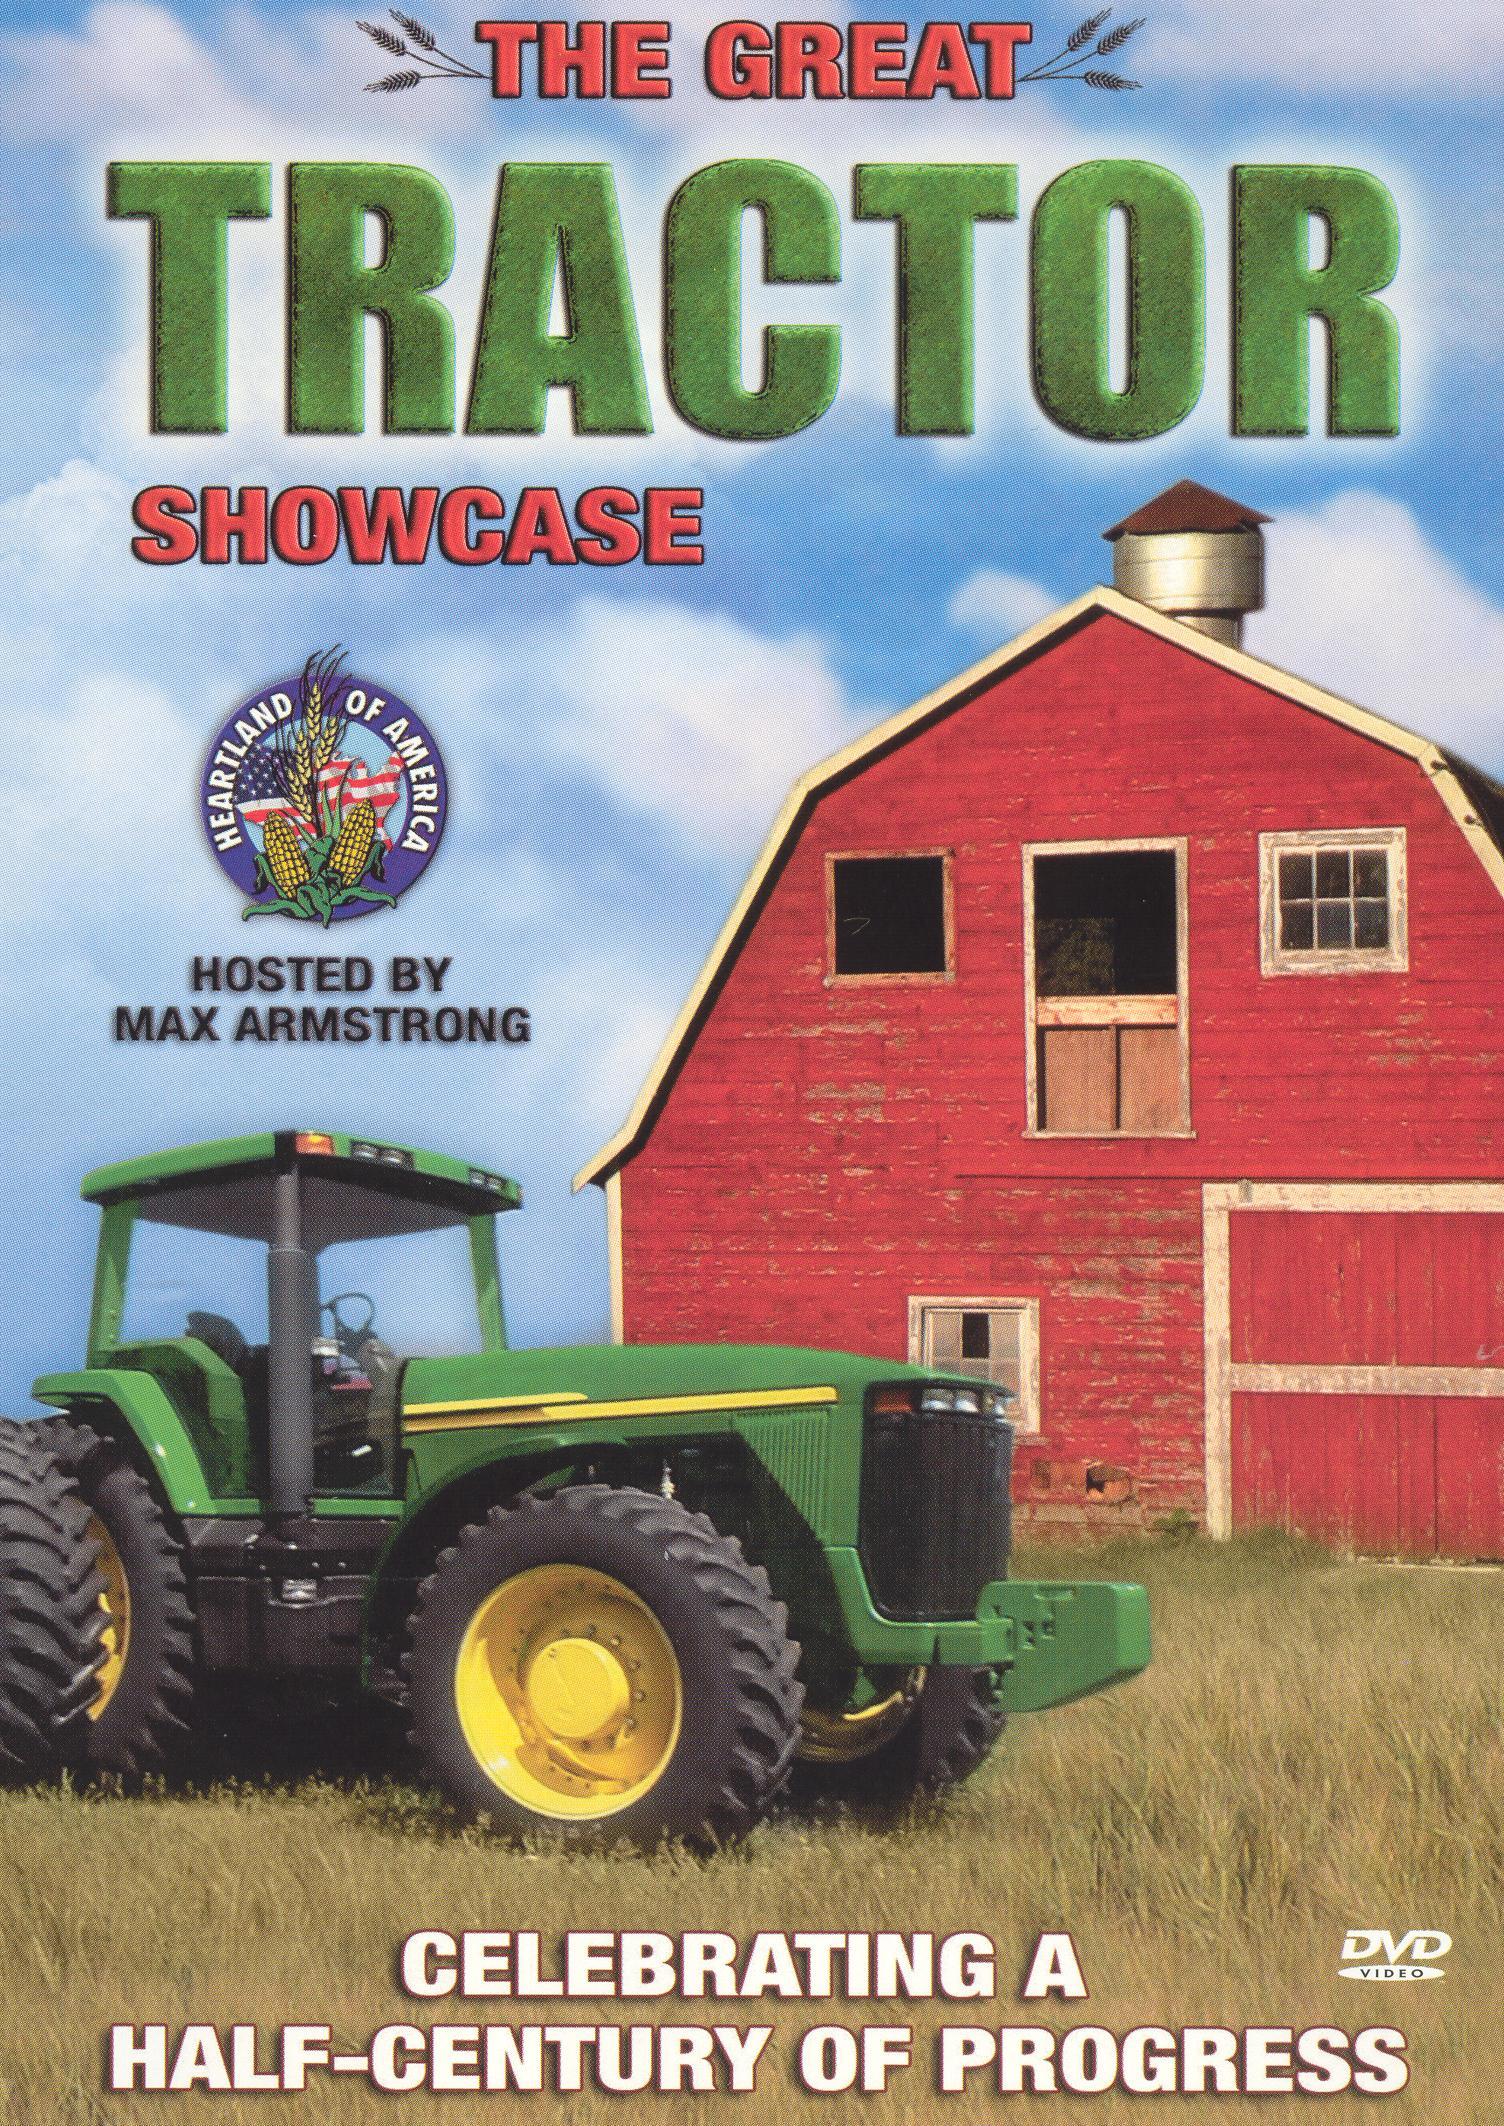 Great Tractor Showcase: Celebrating a Half-Century of Progress